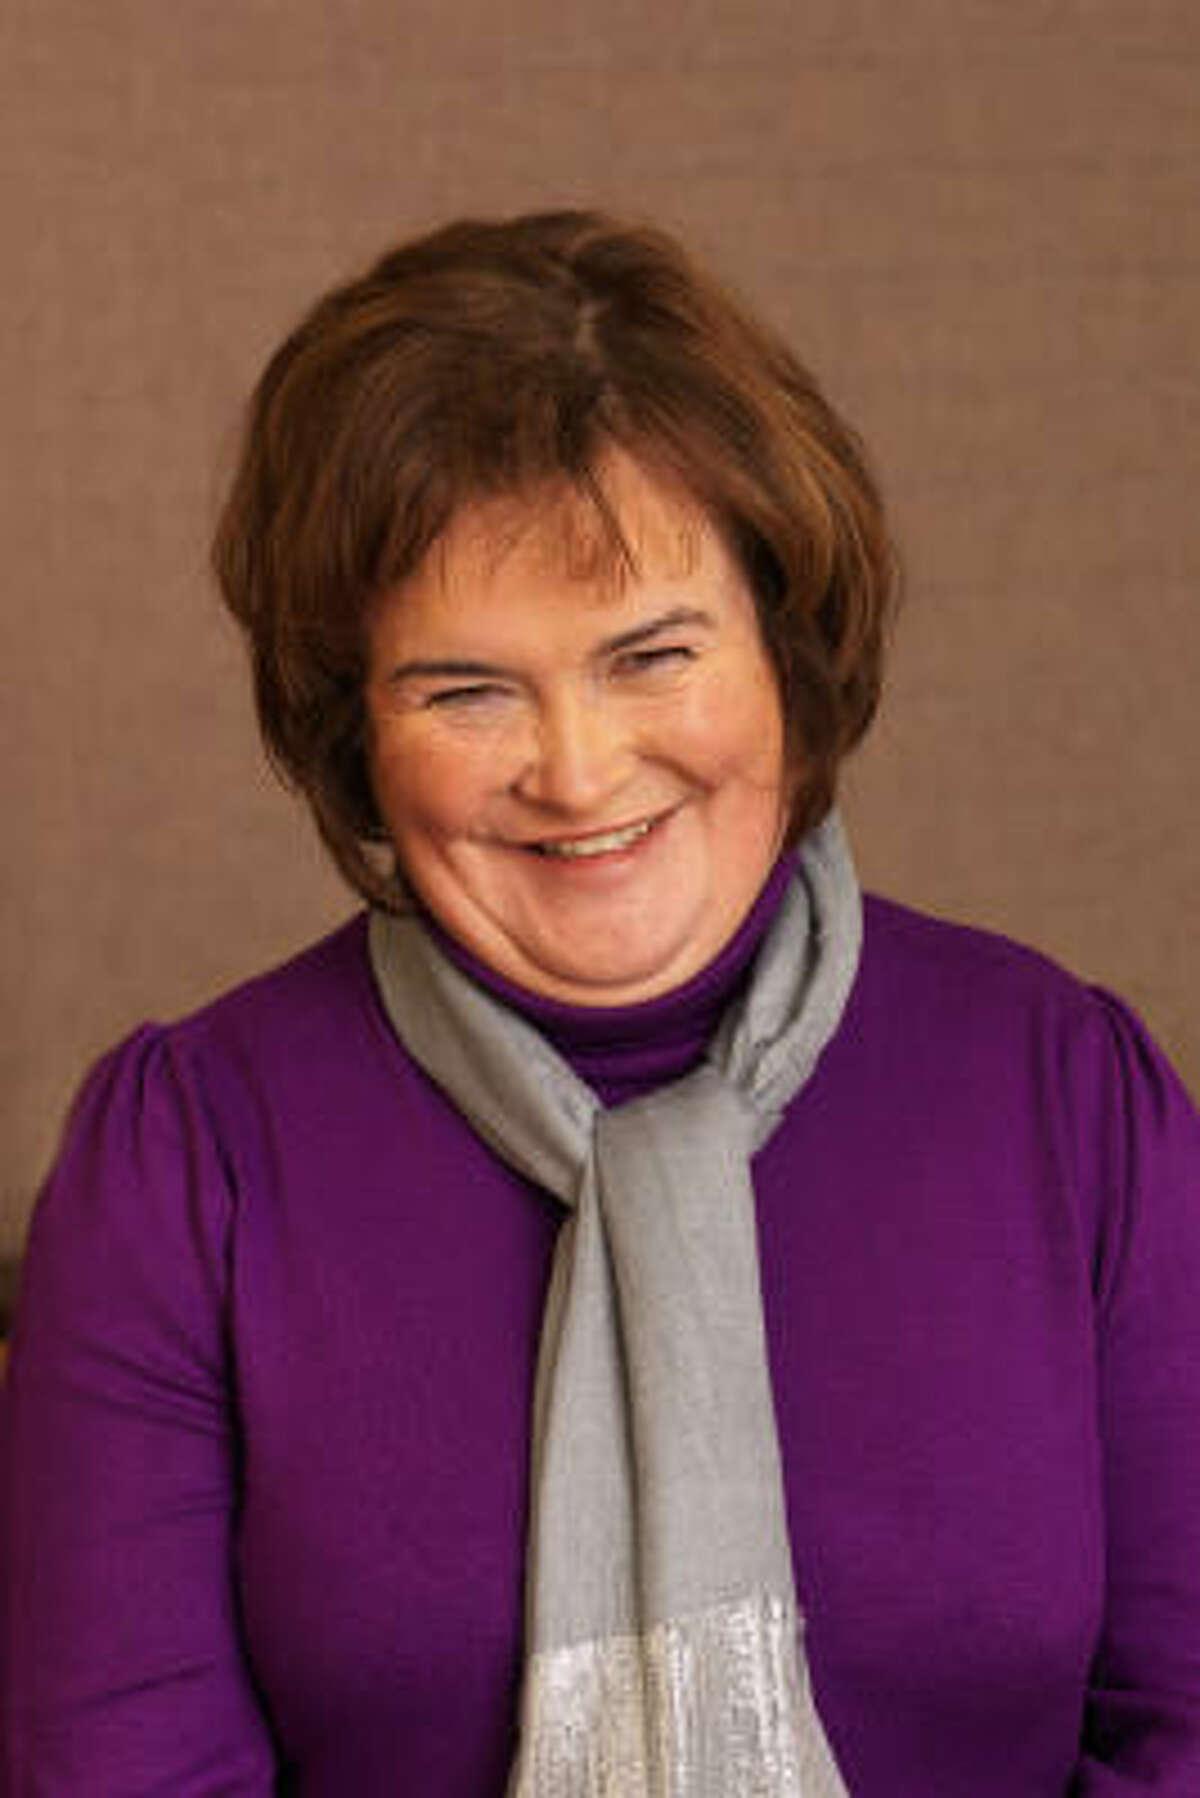 Susan Boyle Turned 50 on April 1.